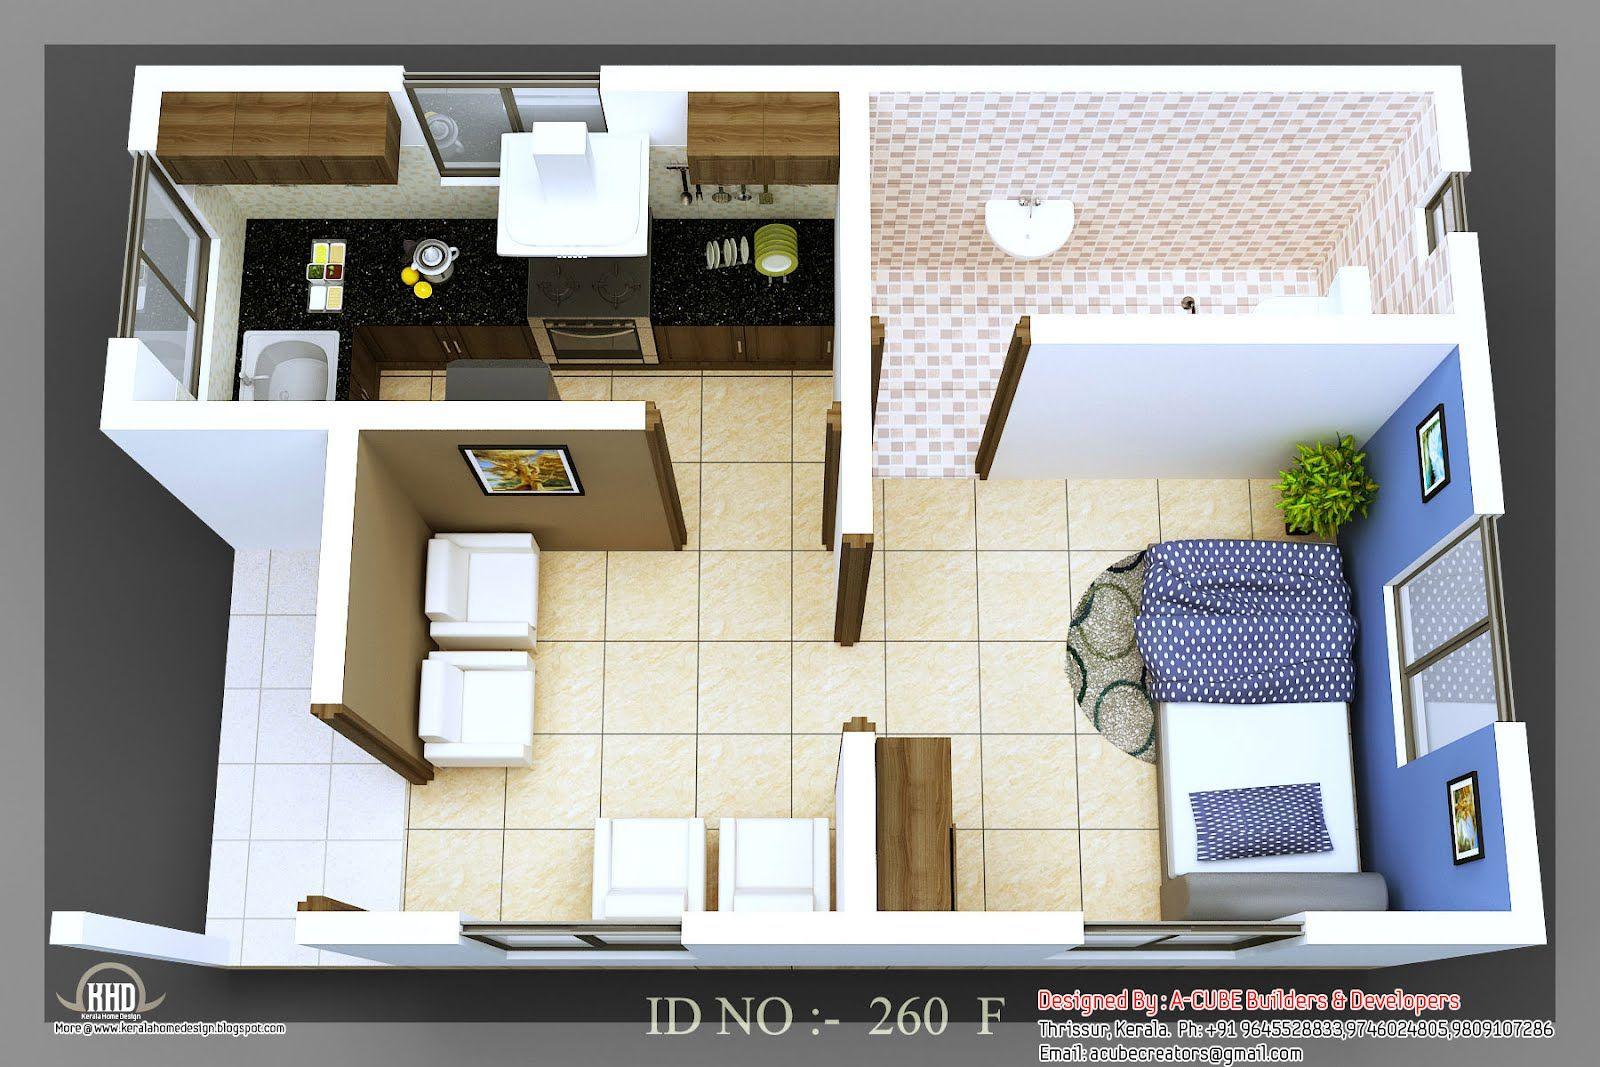 Cool Views Small House Plans Kerala Home Design Floor Plans Largest Home Design Picture Inspirations Pitcheantrous